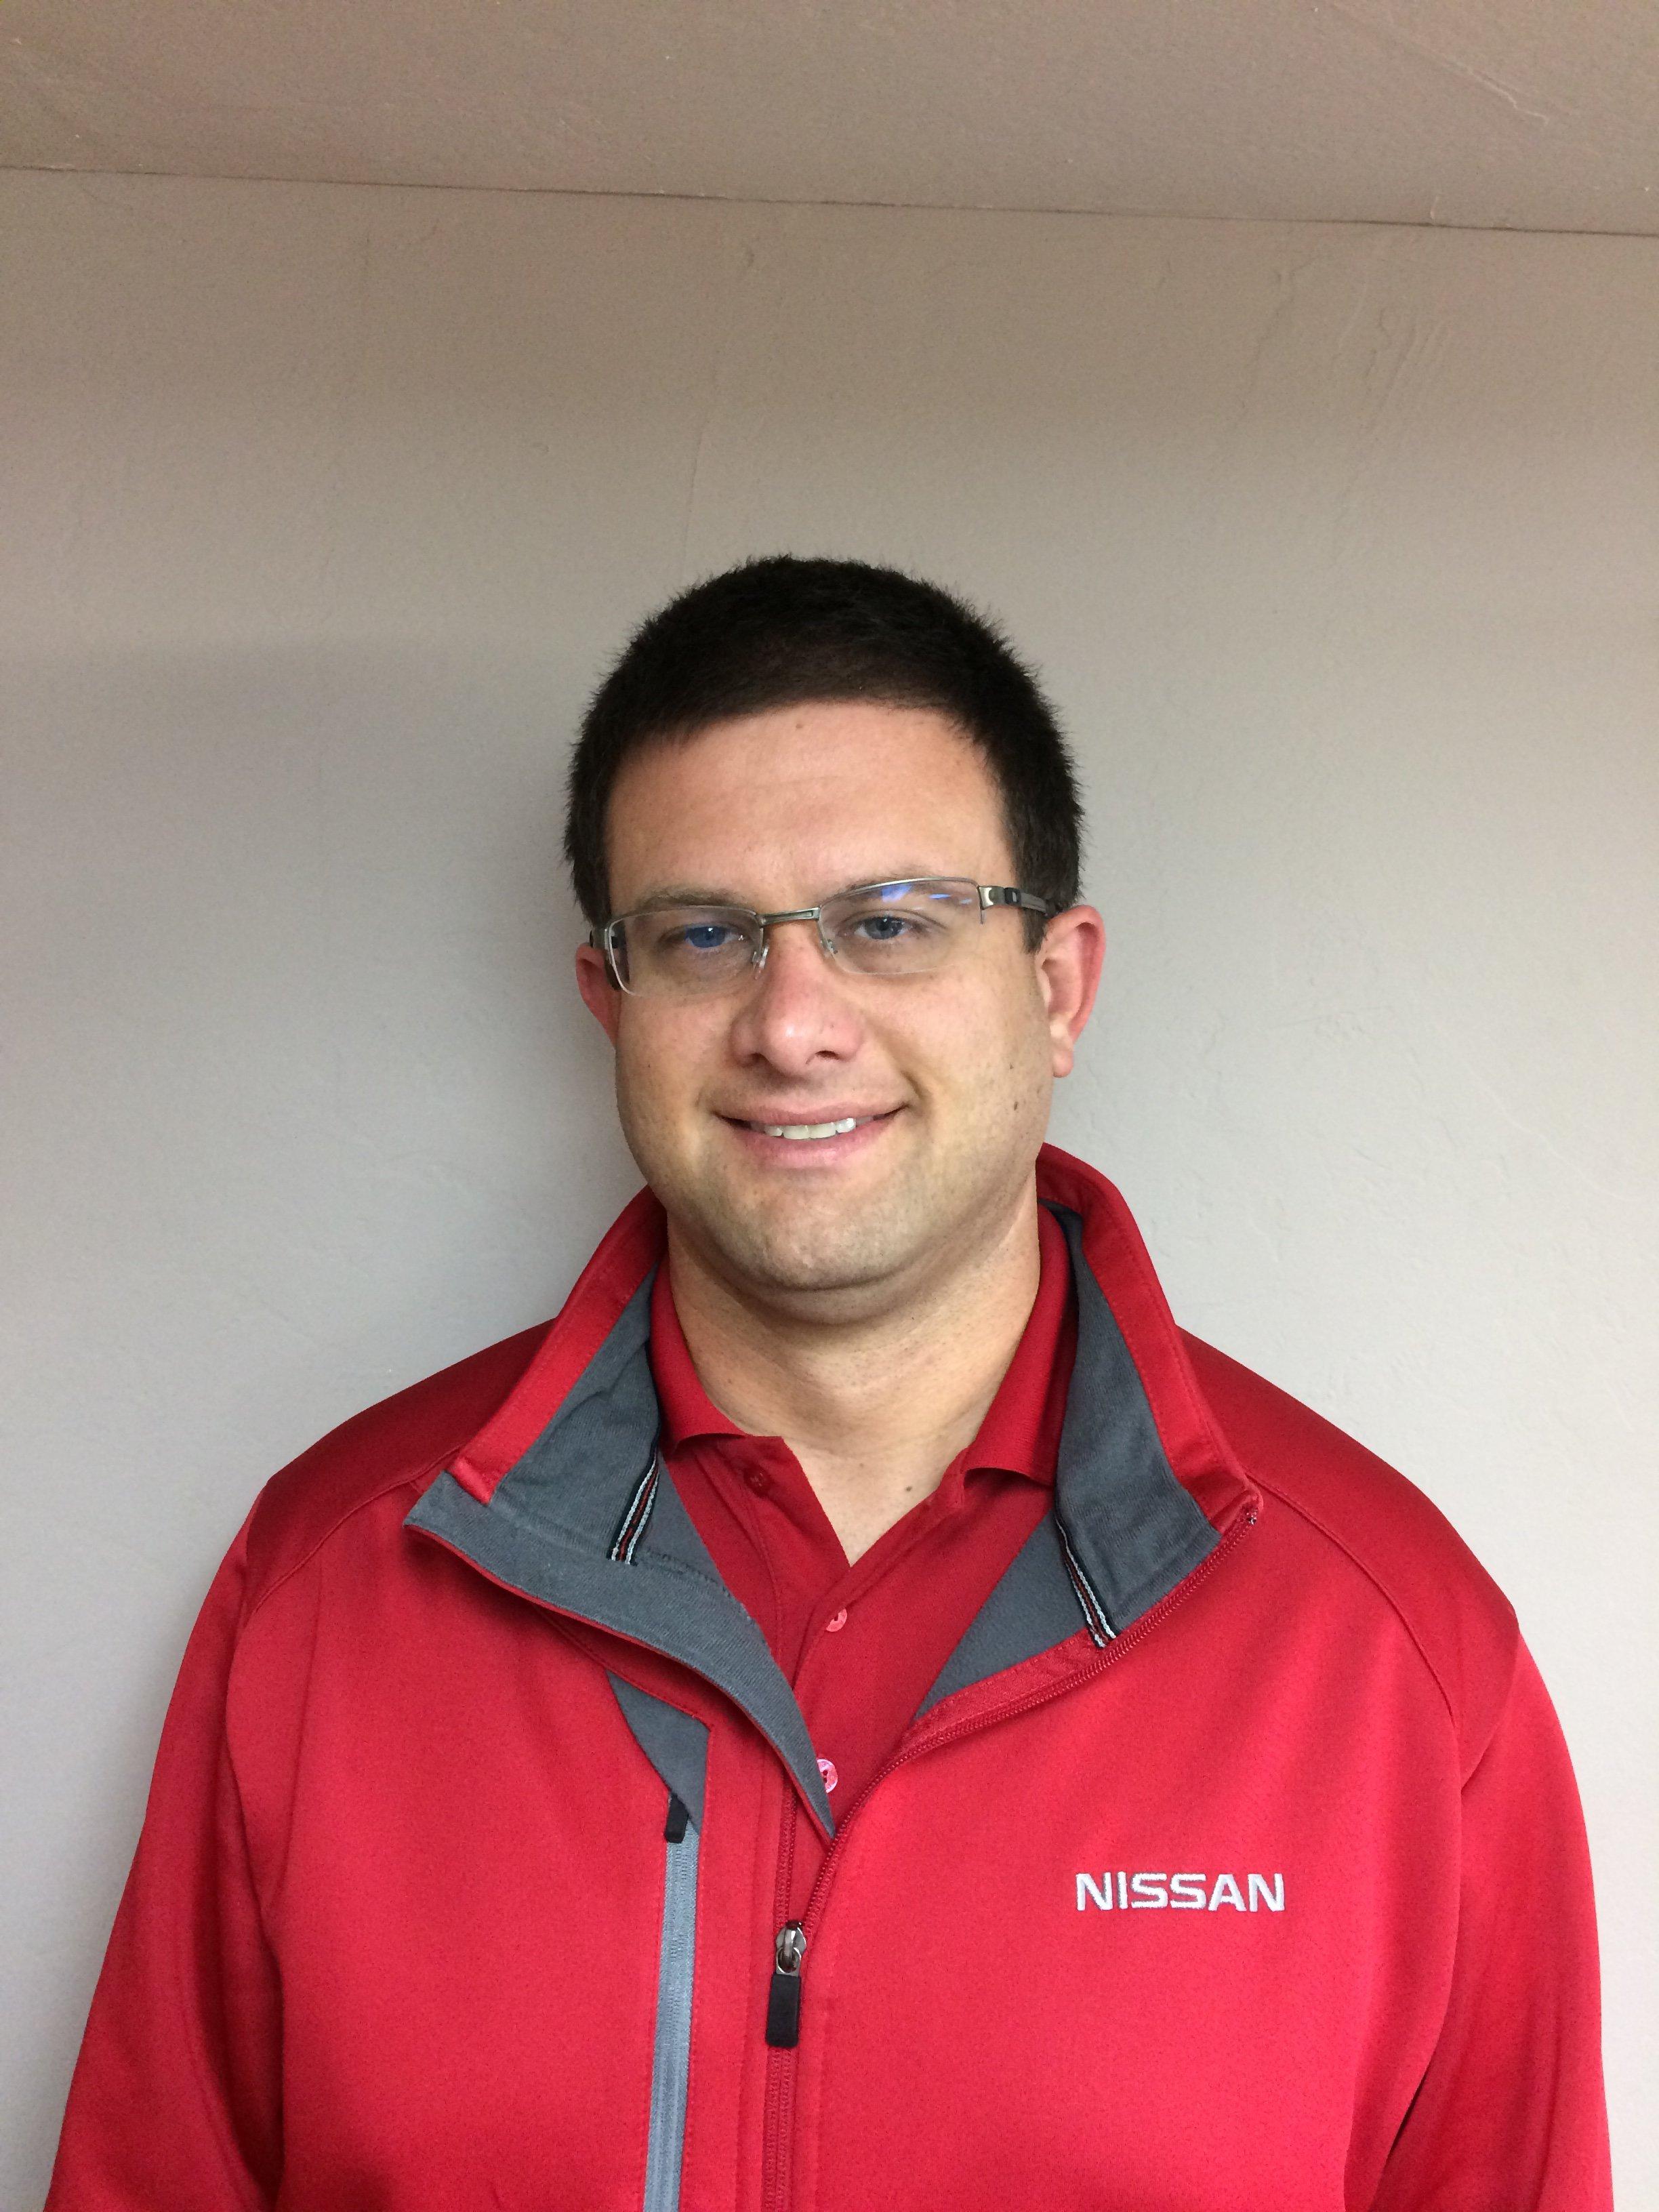 Michael Hagen - Sales Manager